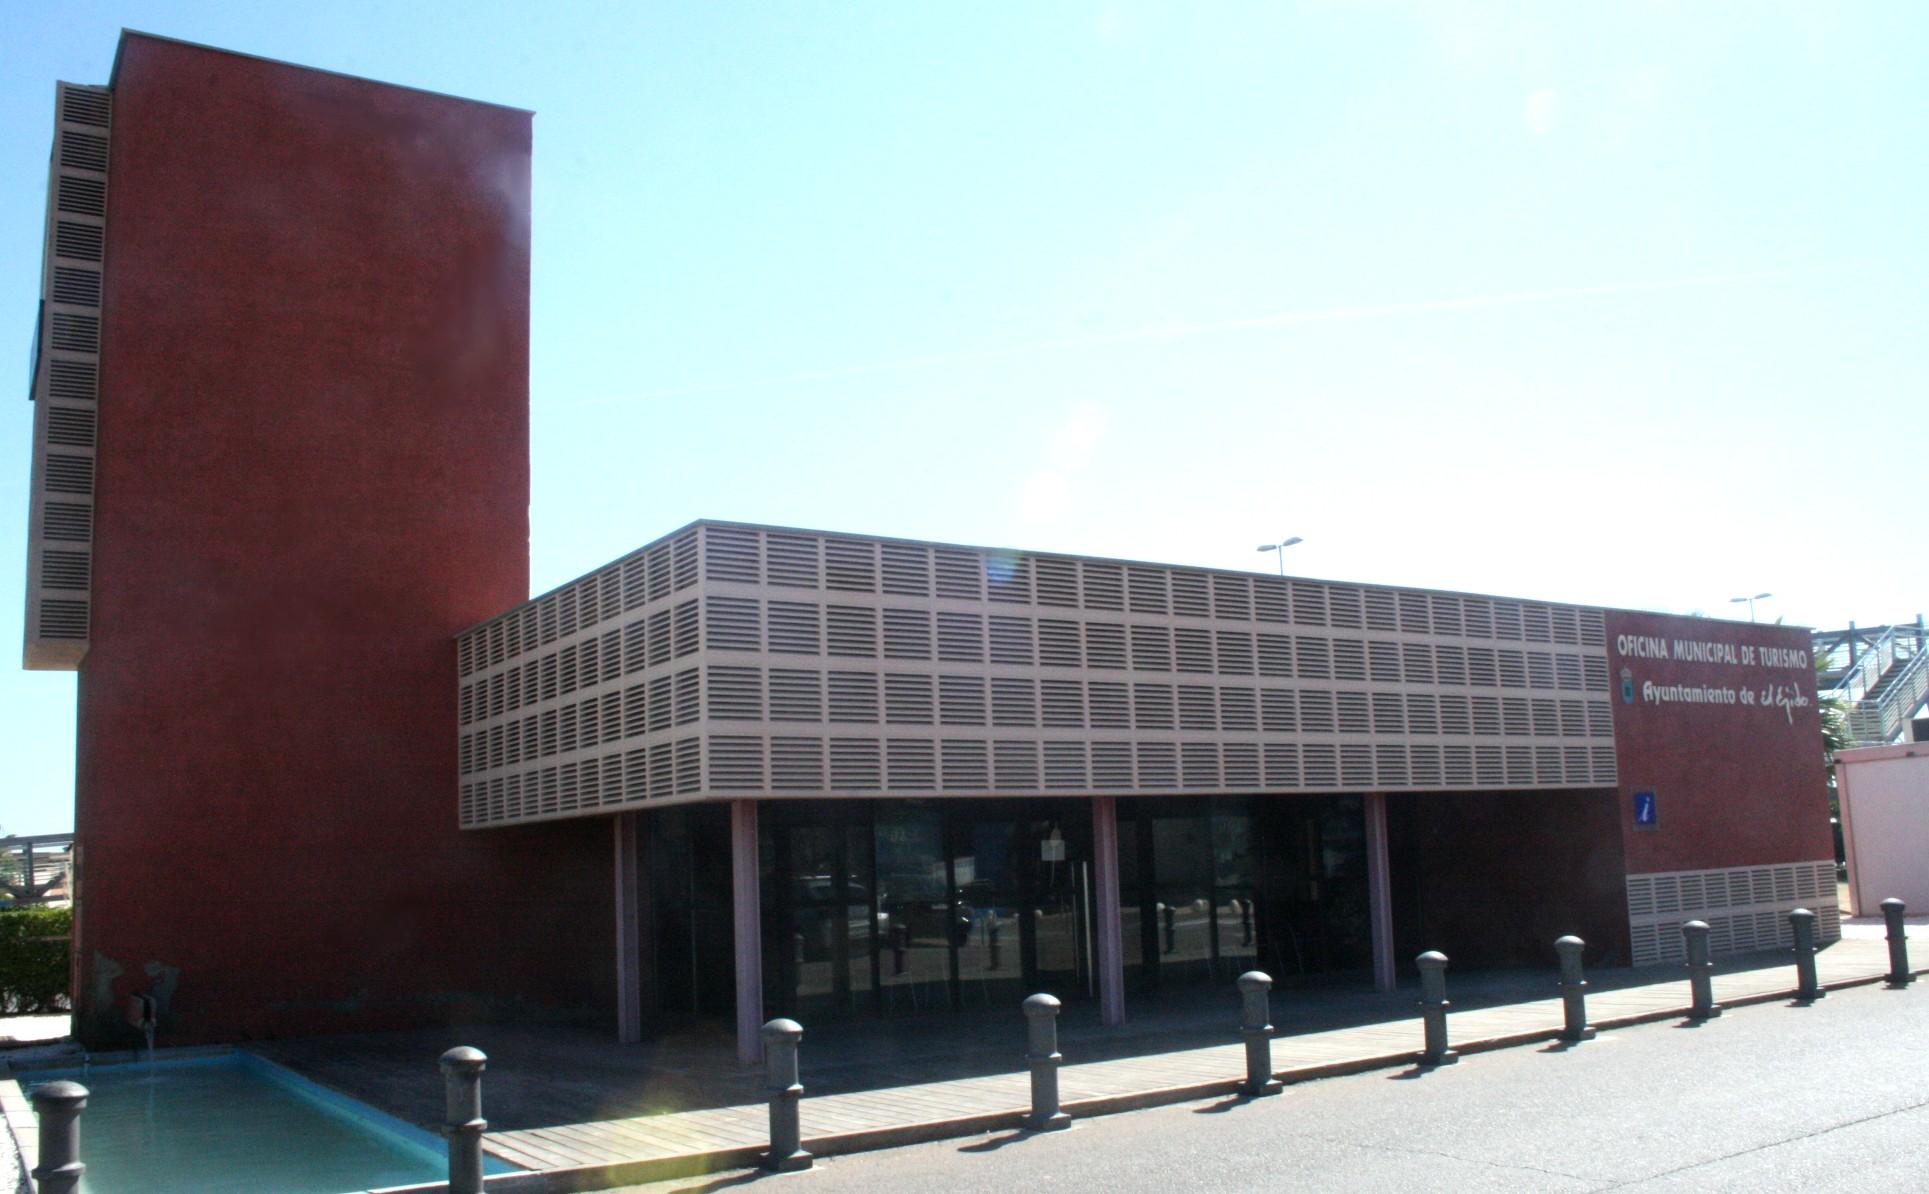 Oficina Municipal de Turismo de El Ejido